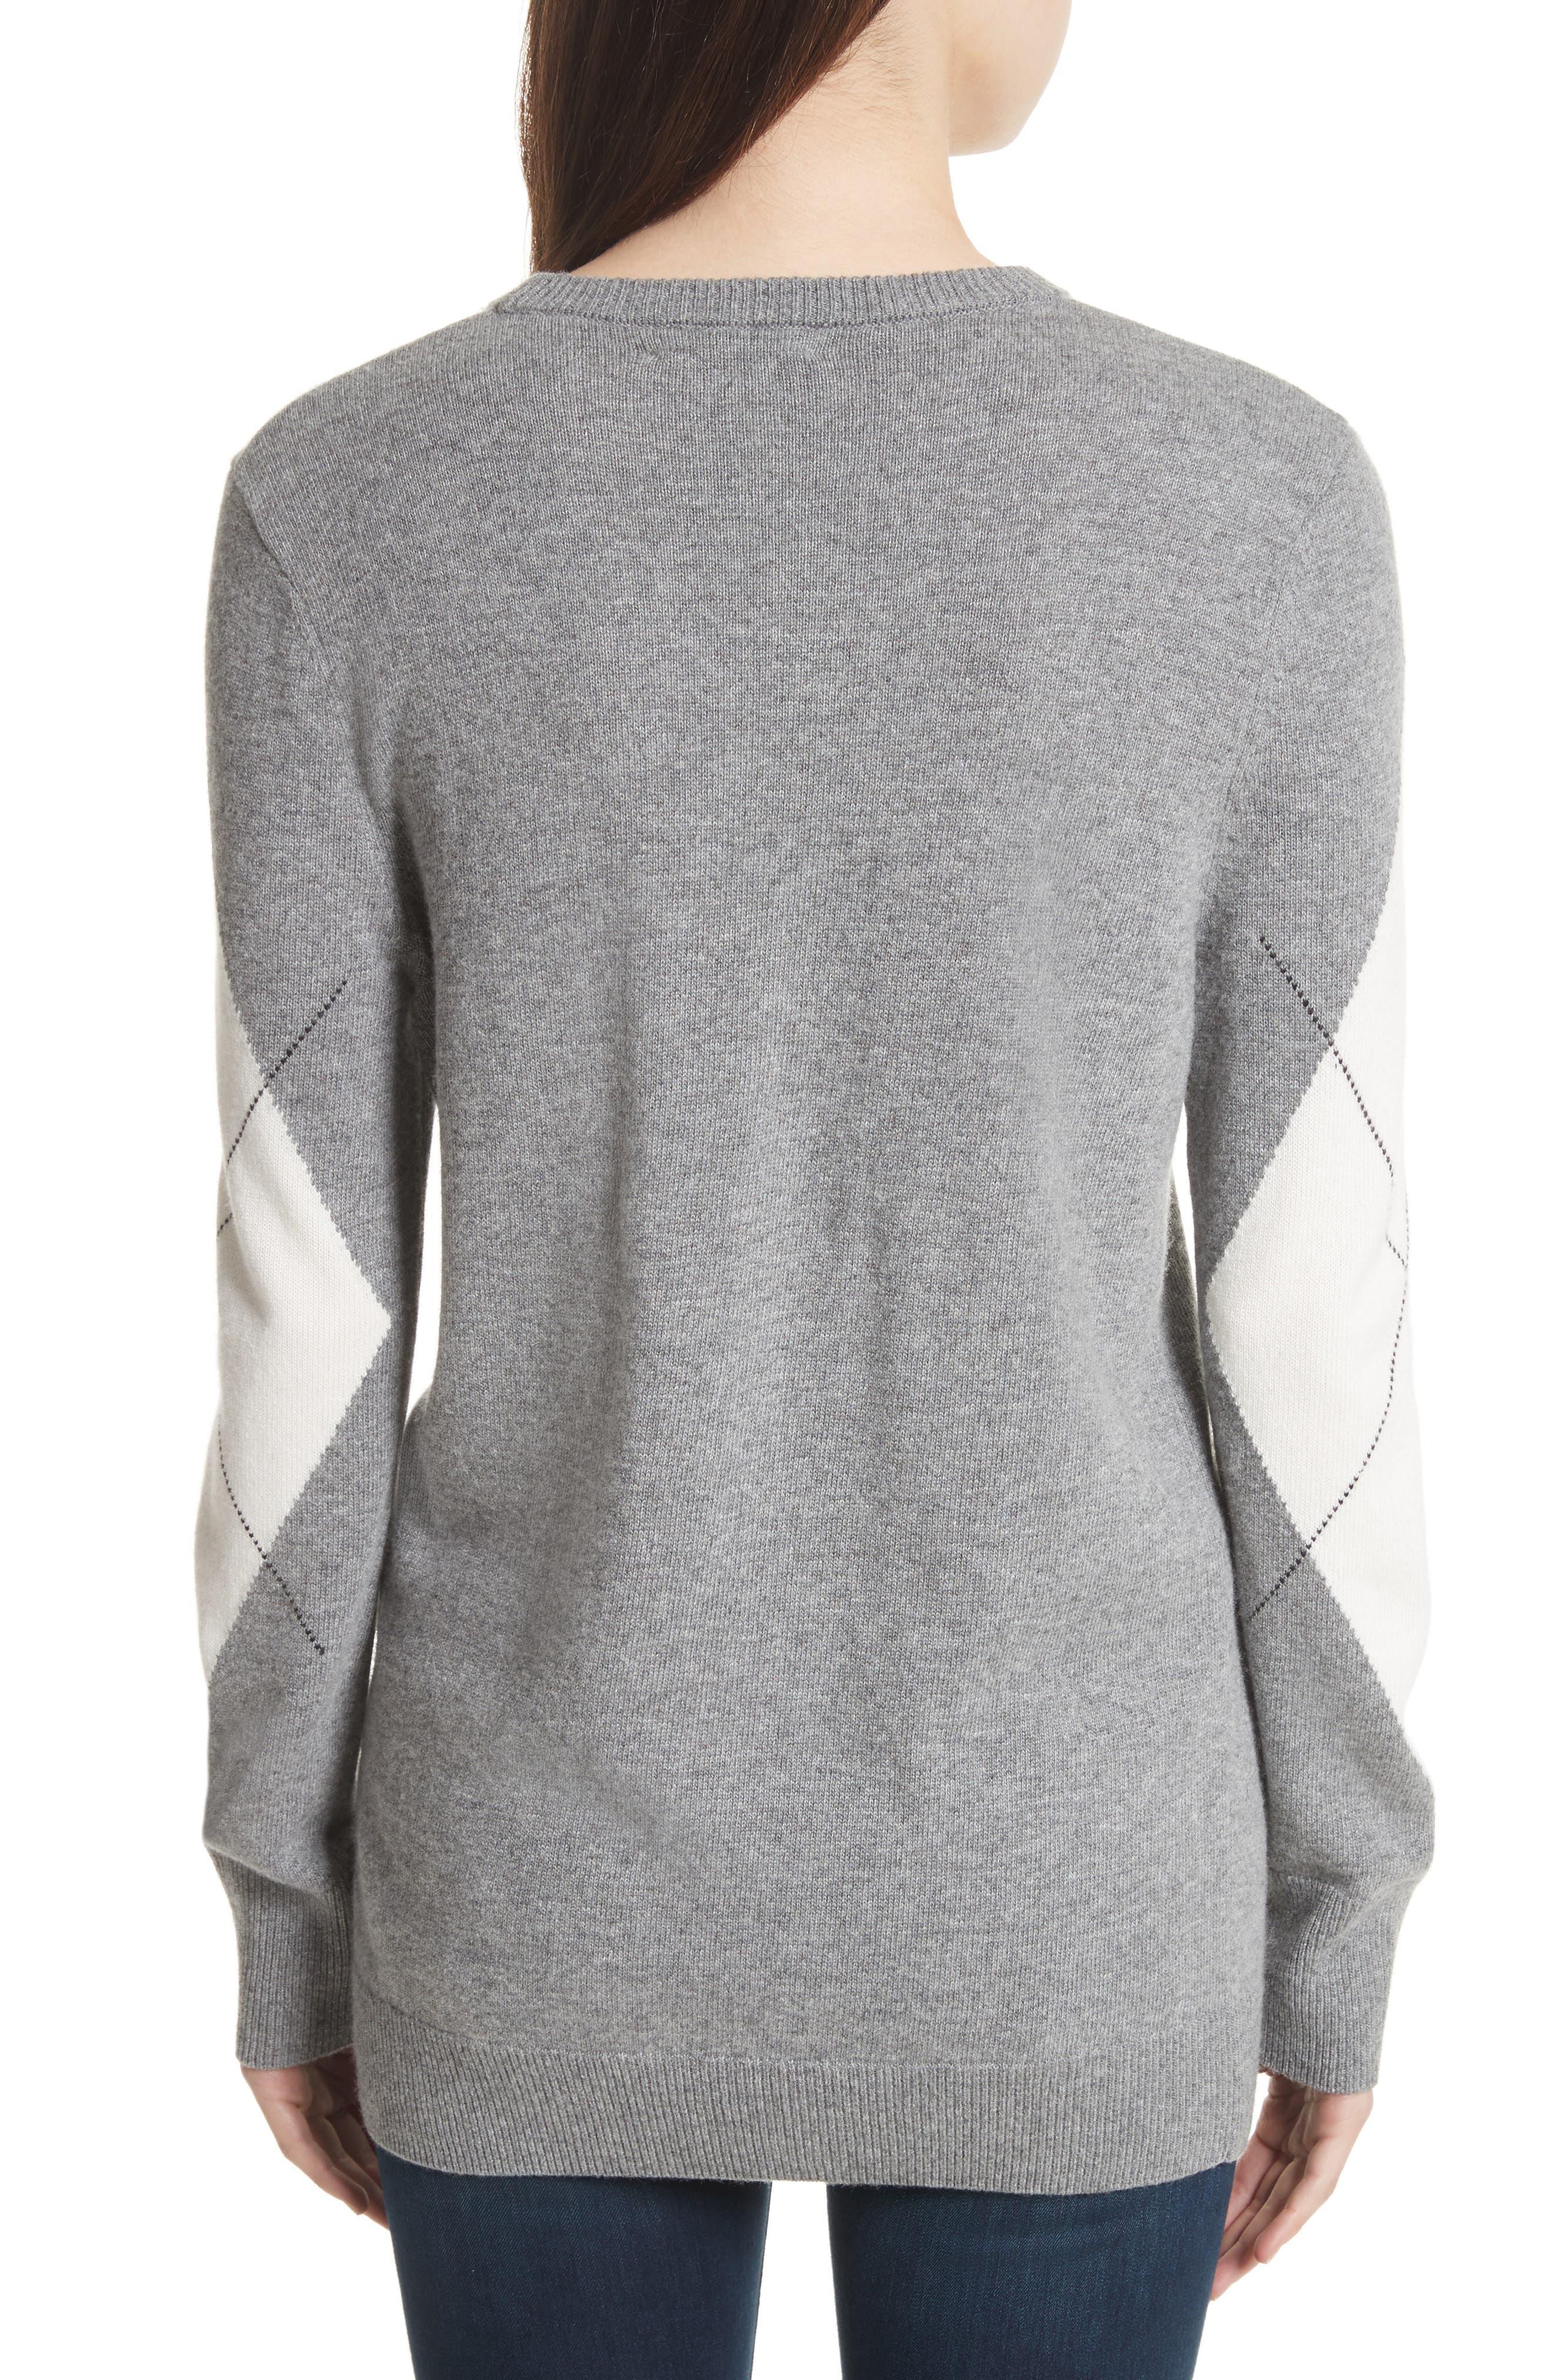 Rei Argyle Crewneck Sweater,                             Alternate thumbnail 2, color,                             077